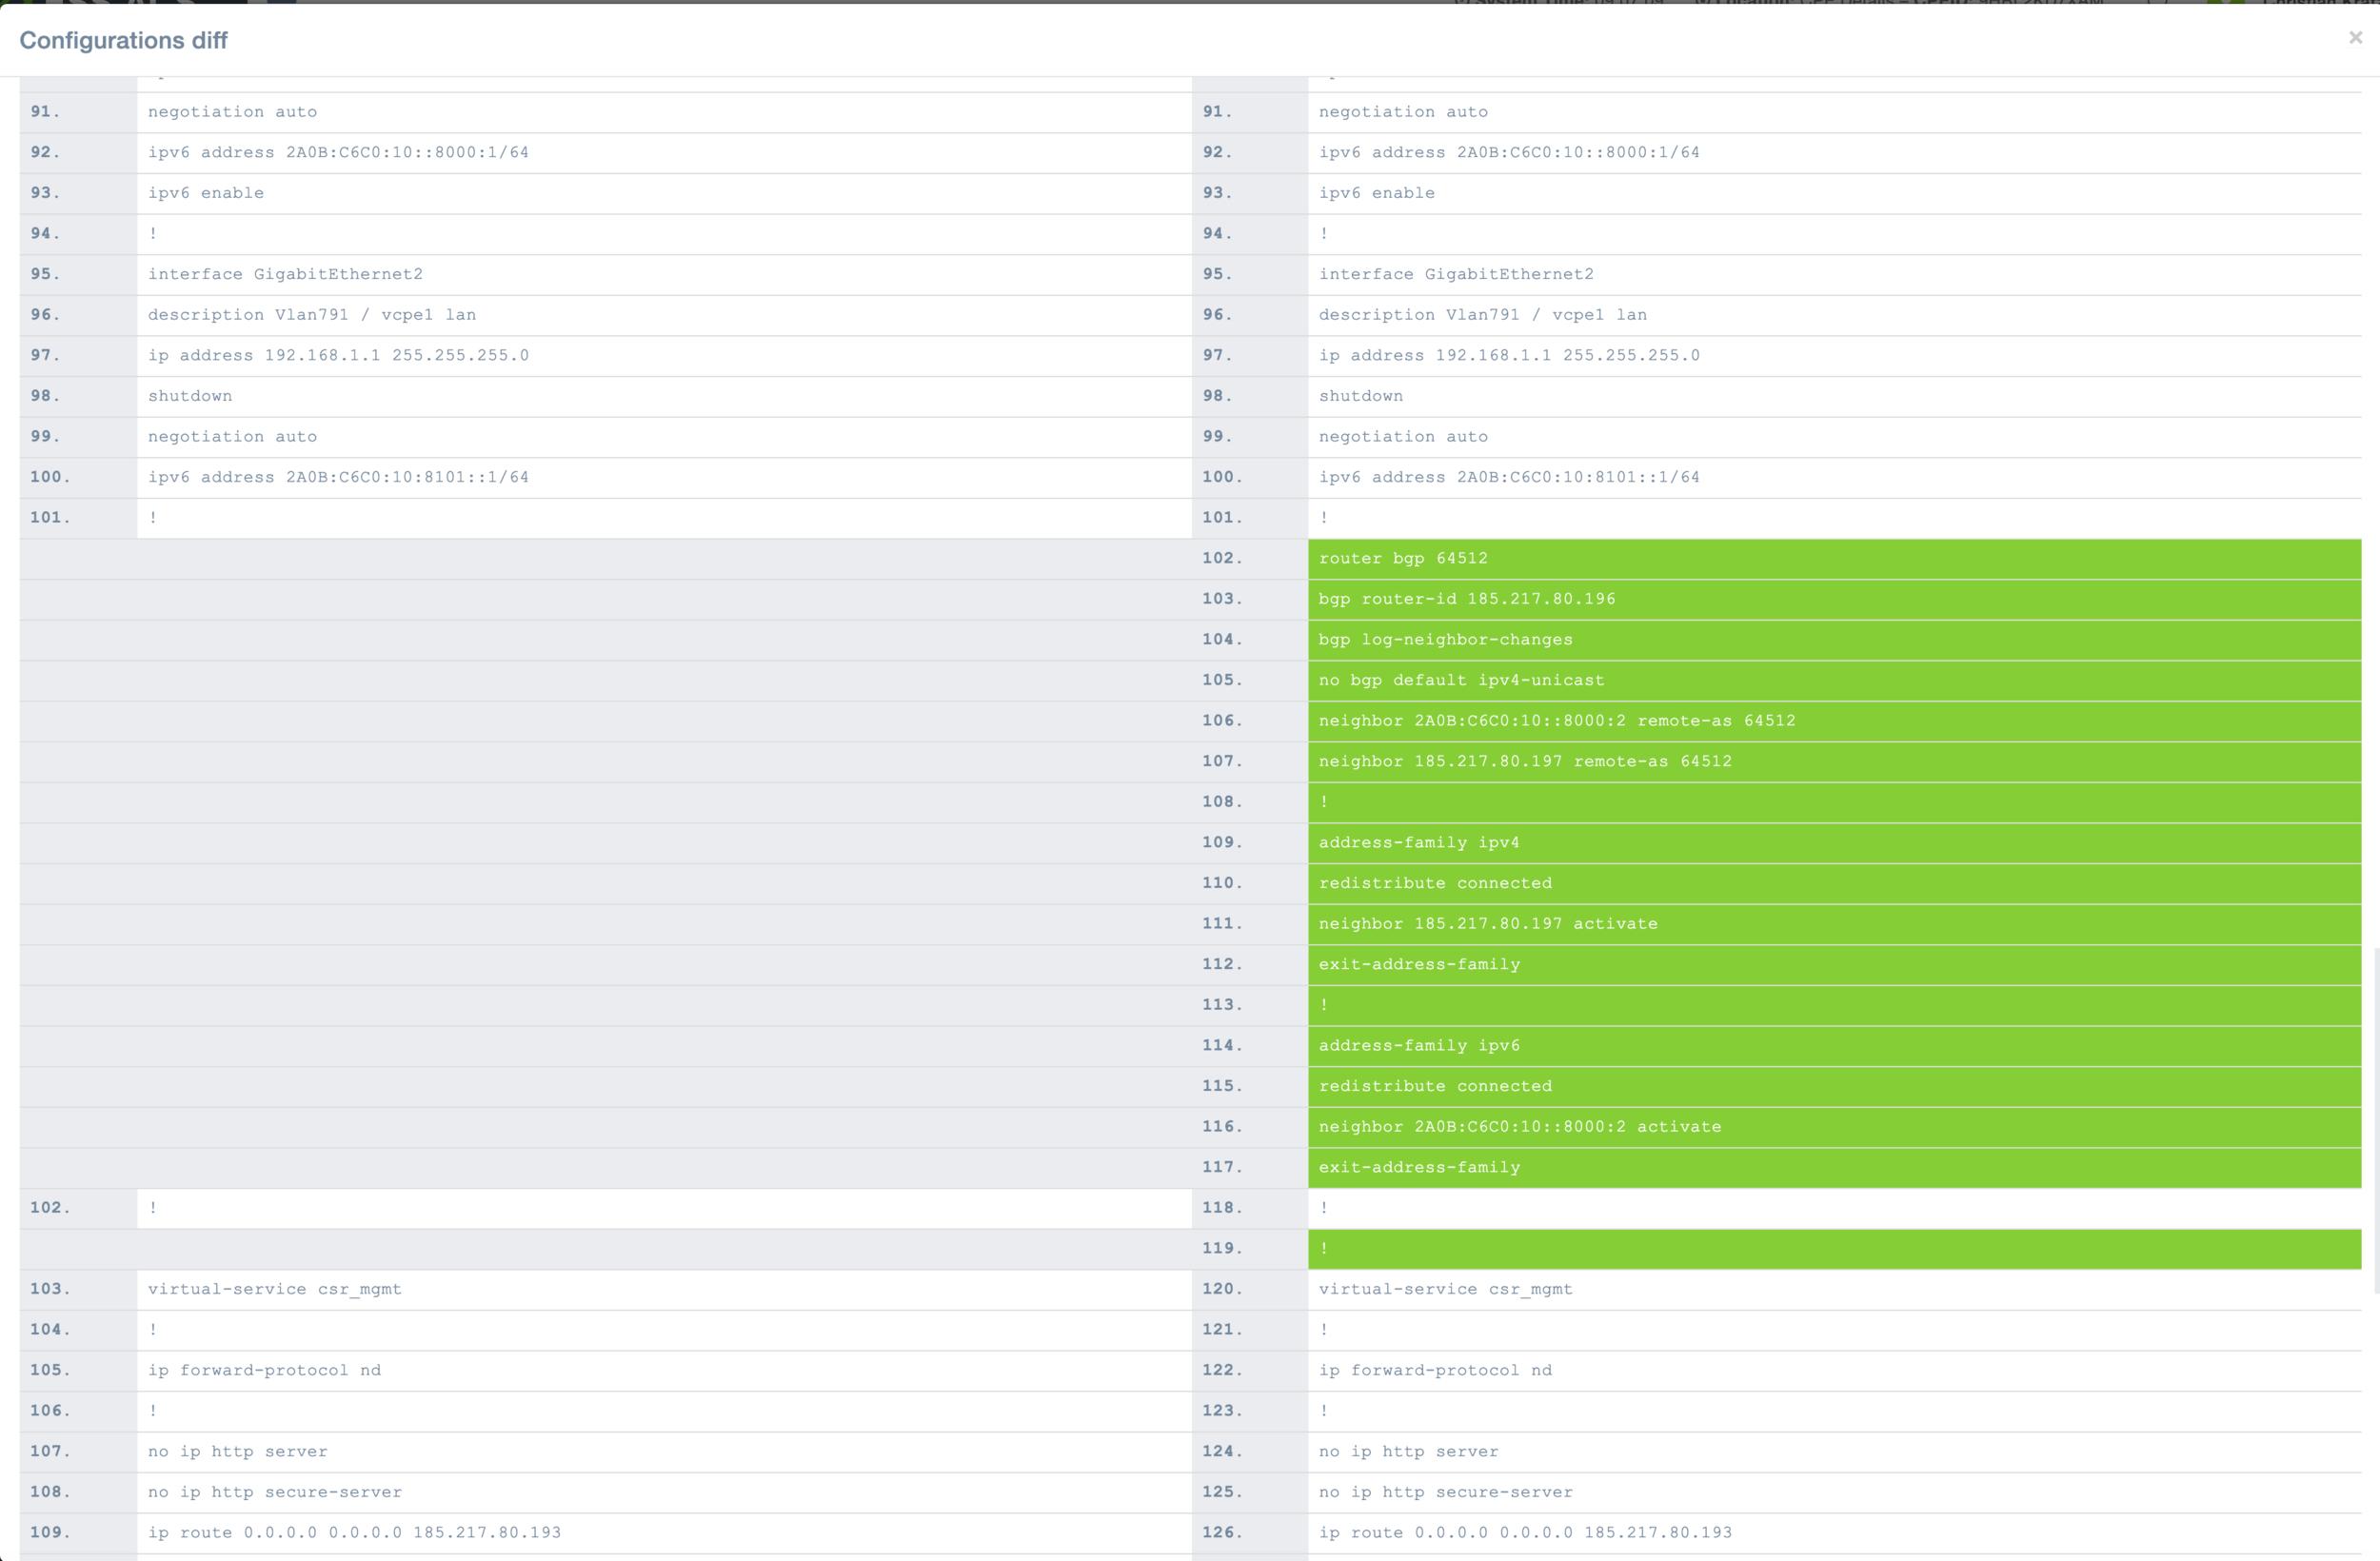 AXBIZ-Configuration-Compare.png